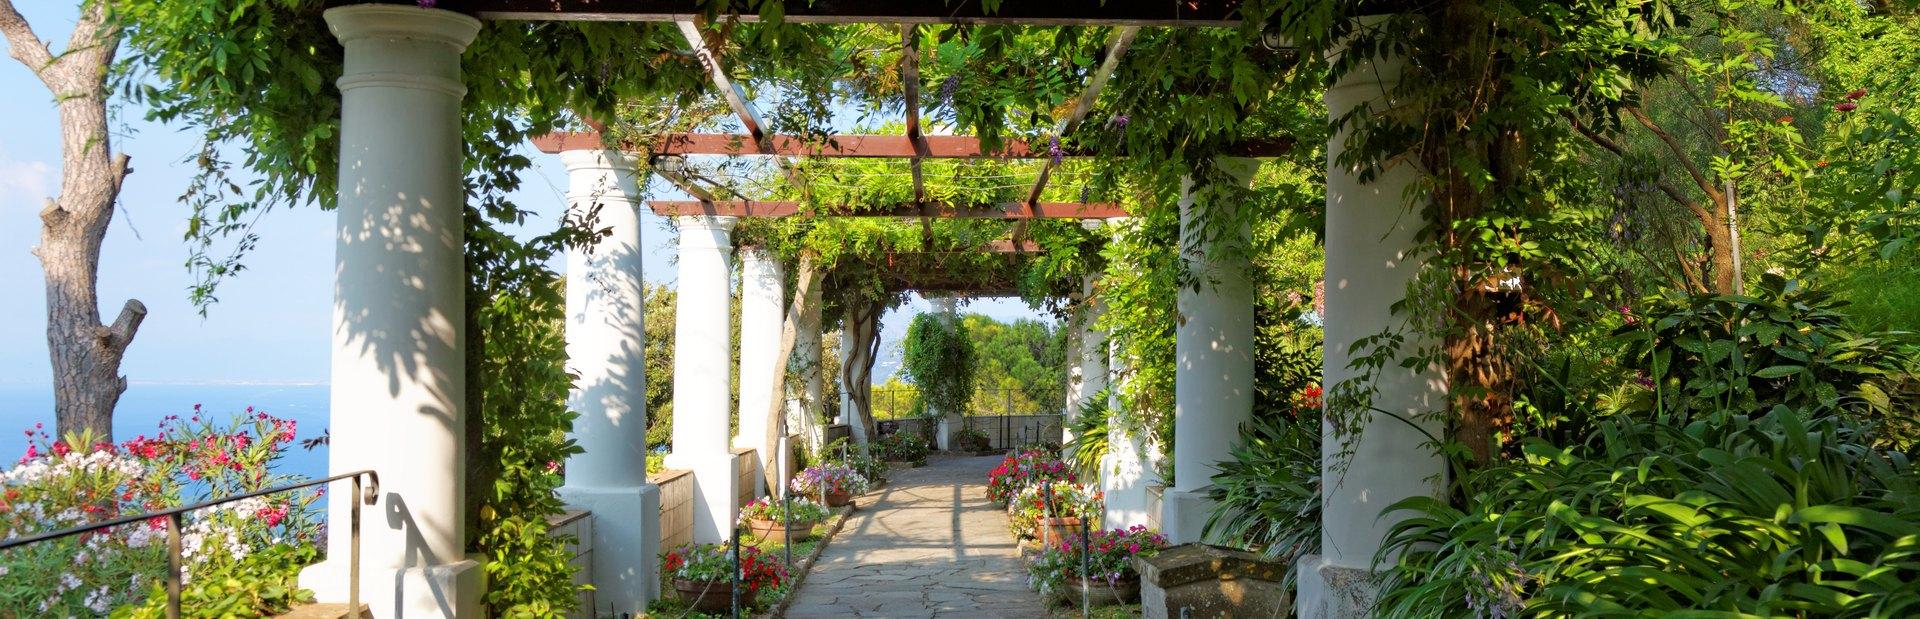 Find serenity in the public gardens of Capri